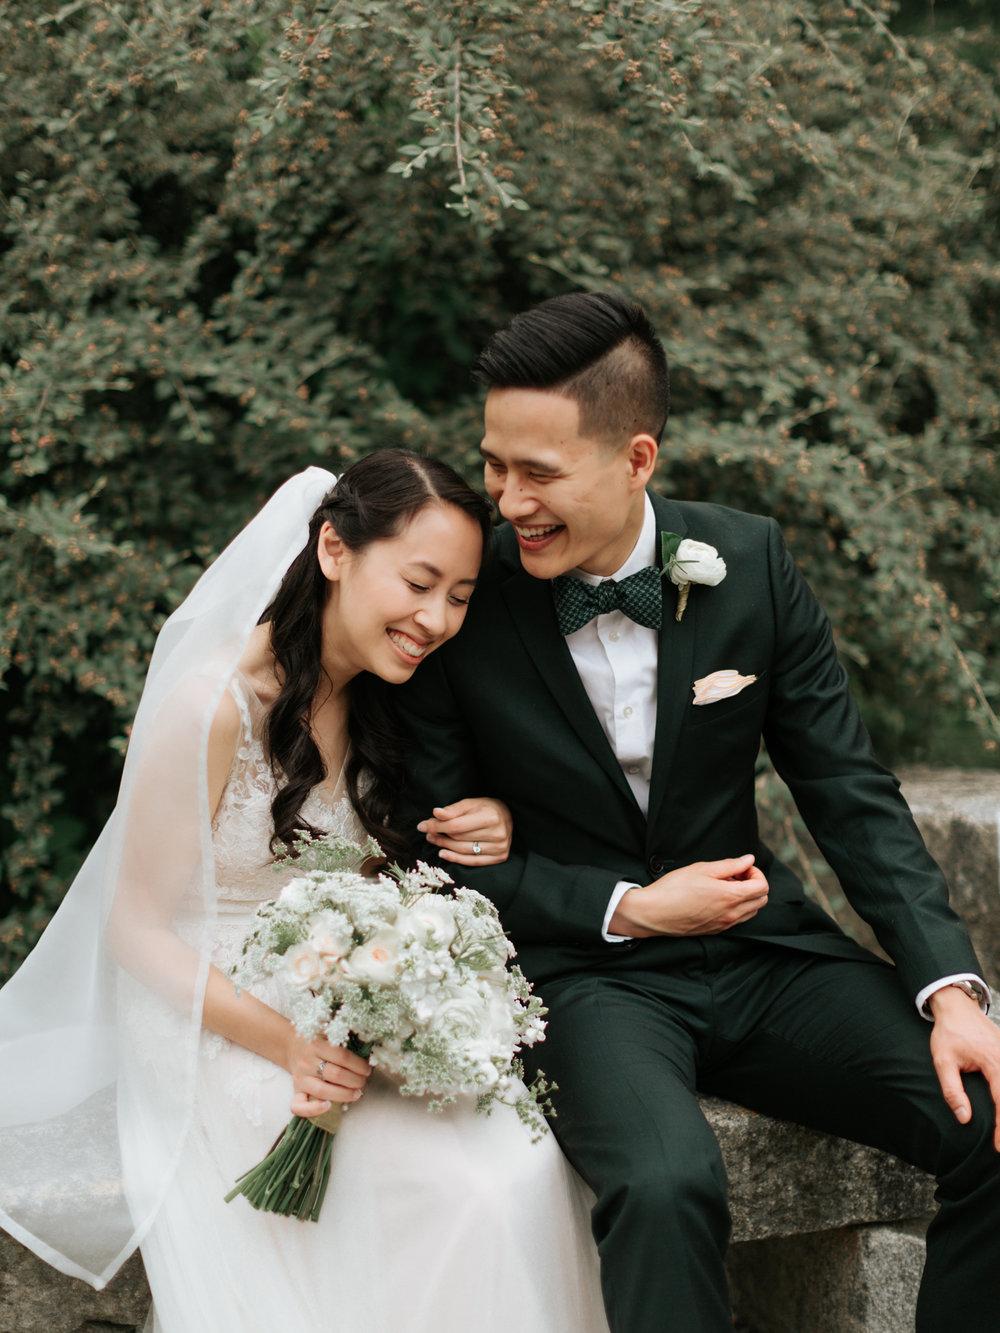 Stolen Glimpses Seattle Wedding Photographer Sodo Park Wedding 49.jpg